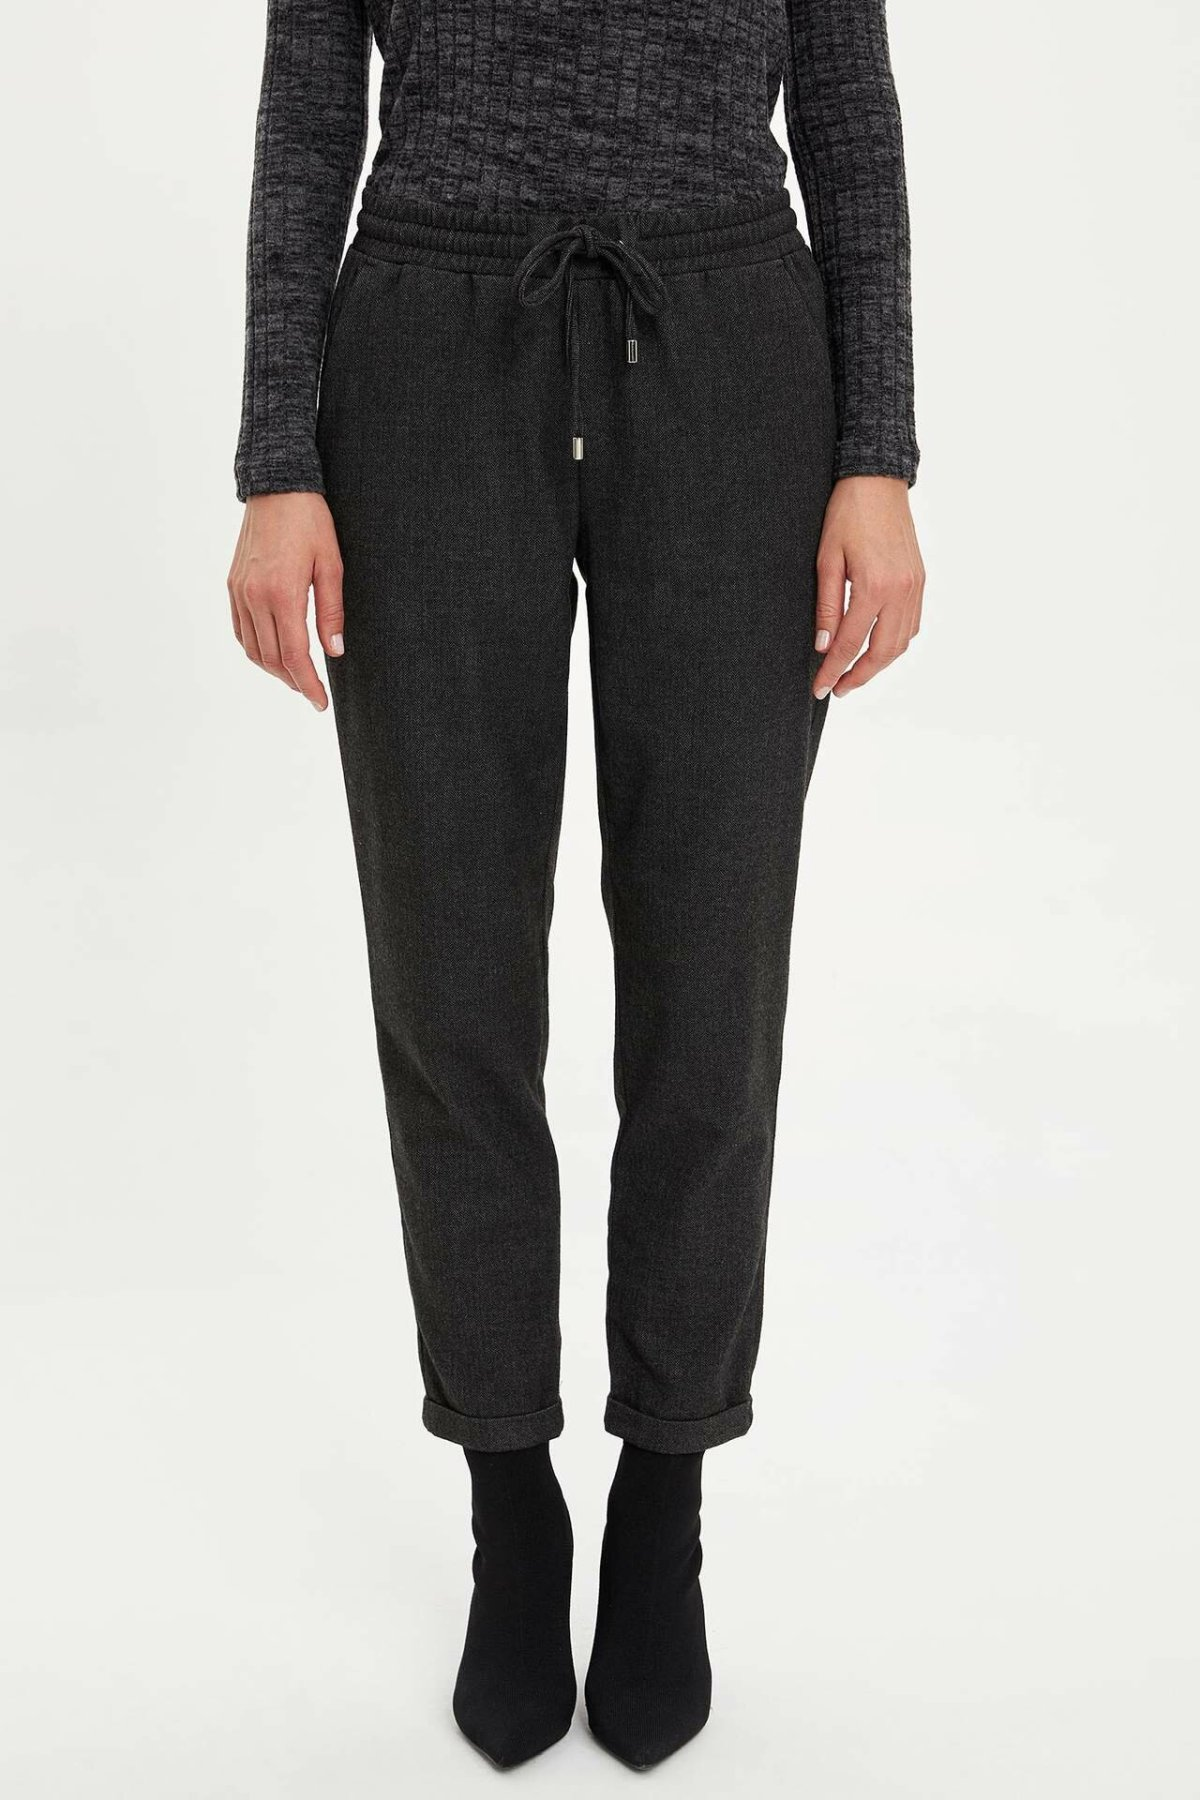 DeFacto New Woman Fashion  Drawstring Trousers Ladies Casual High Quality Crop Pants Female Bottoms Autumn - M4557AZ19WN